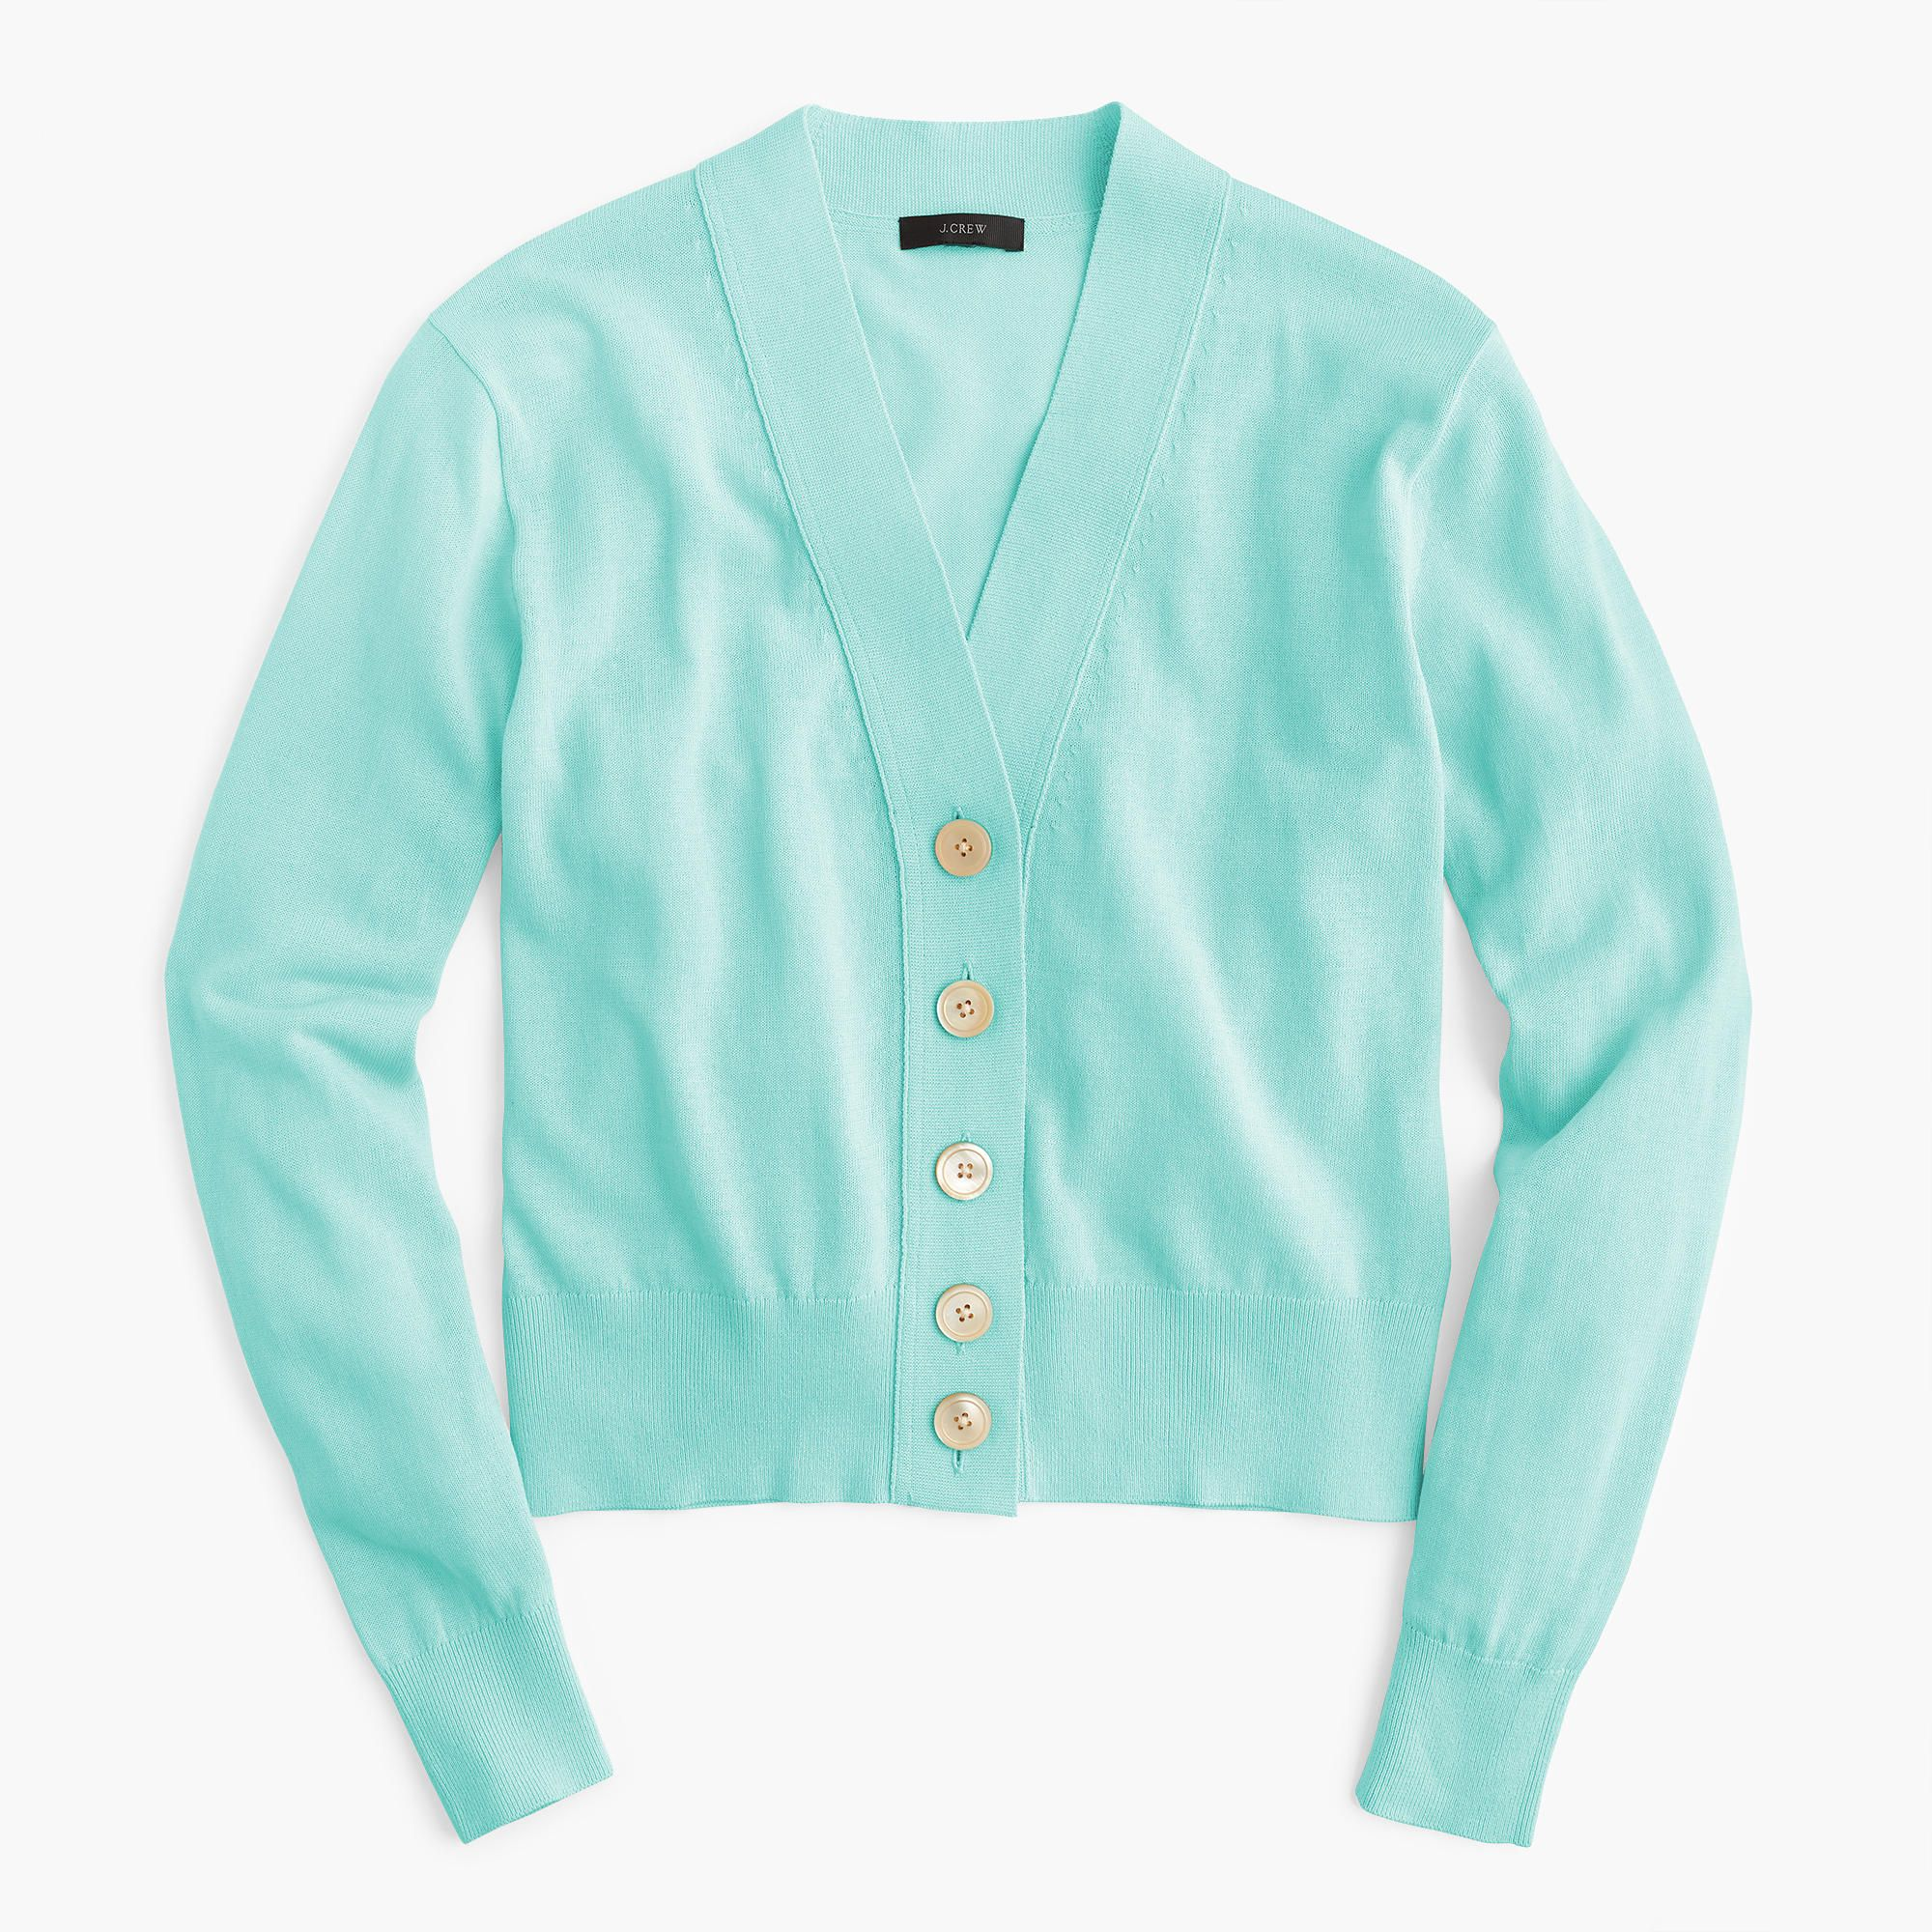 Cropped lightweight cardigan sweater in brilliant aqua | J. Crew ...